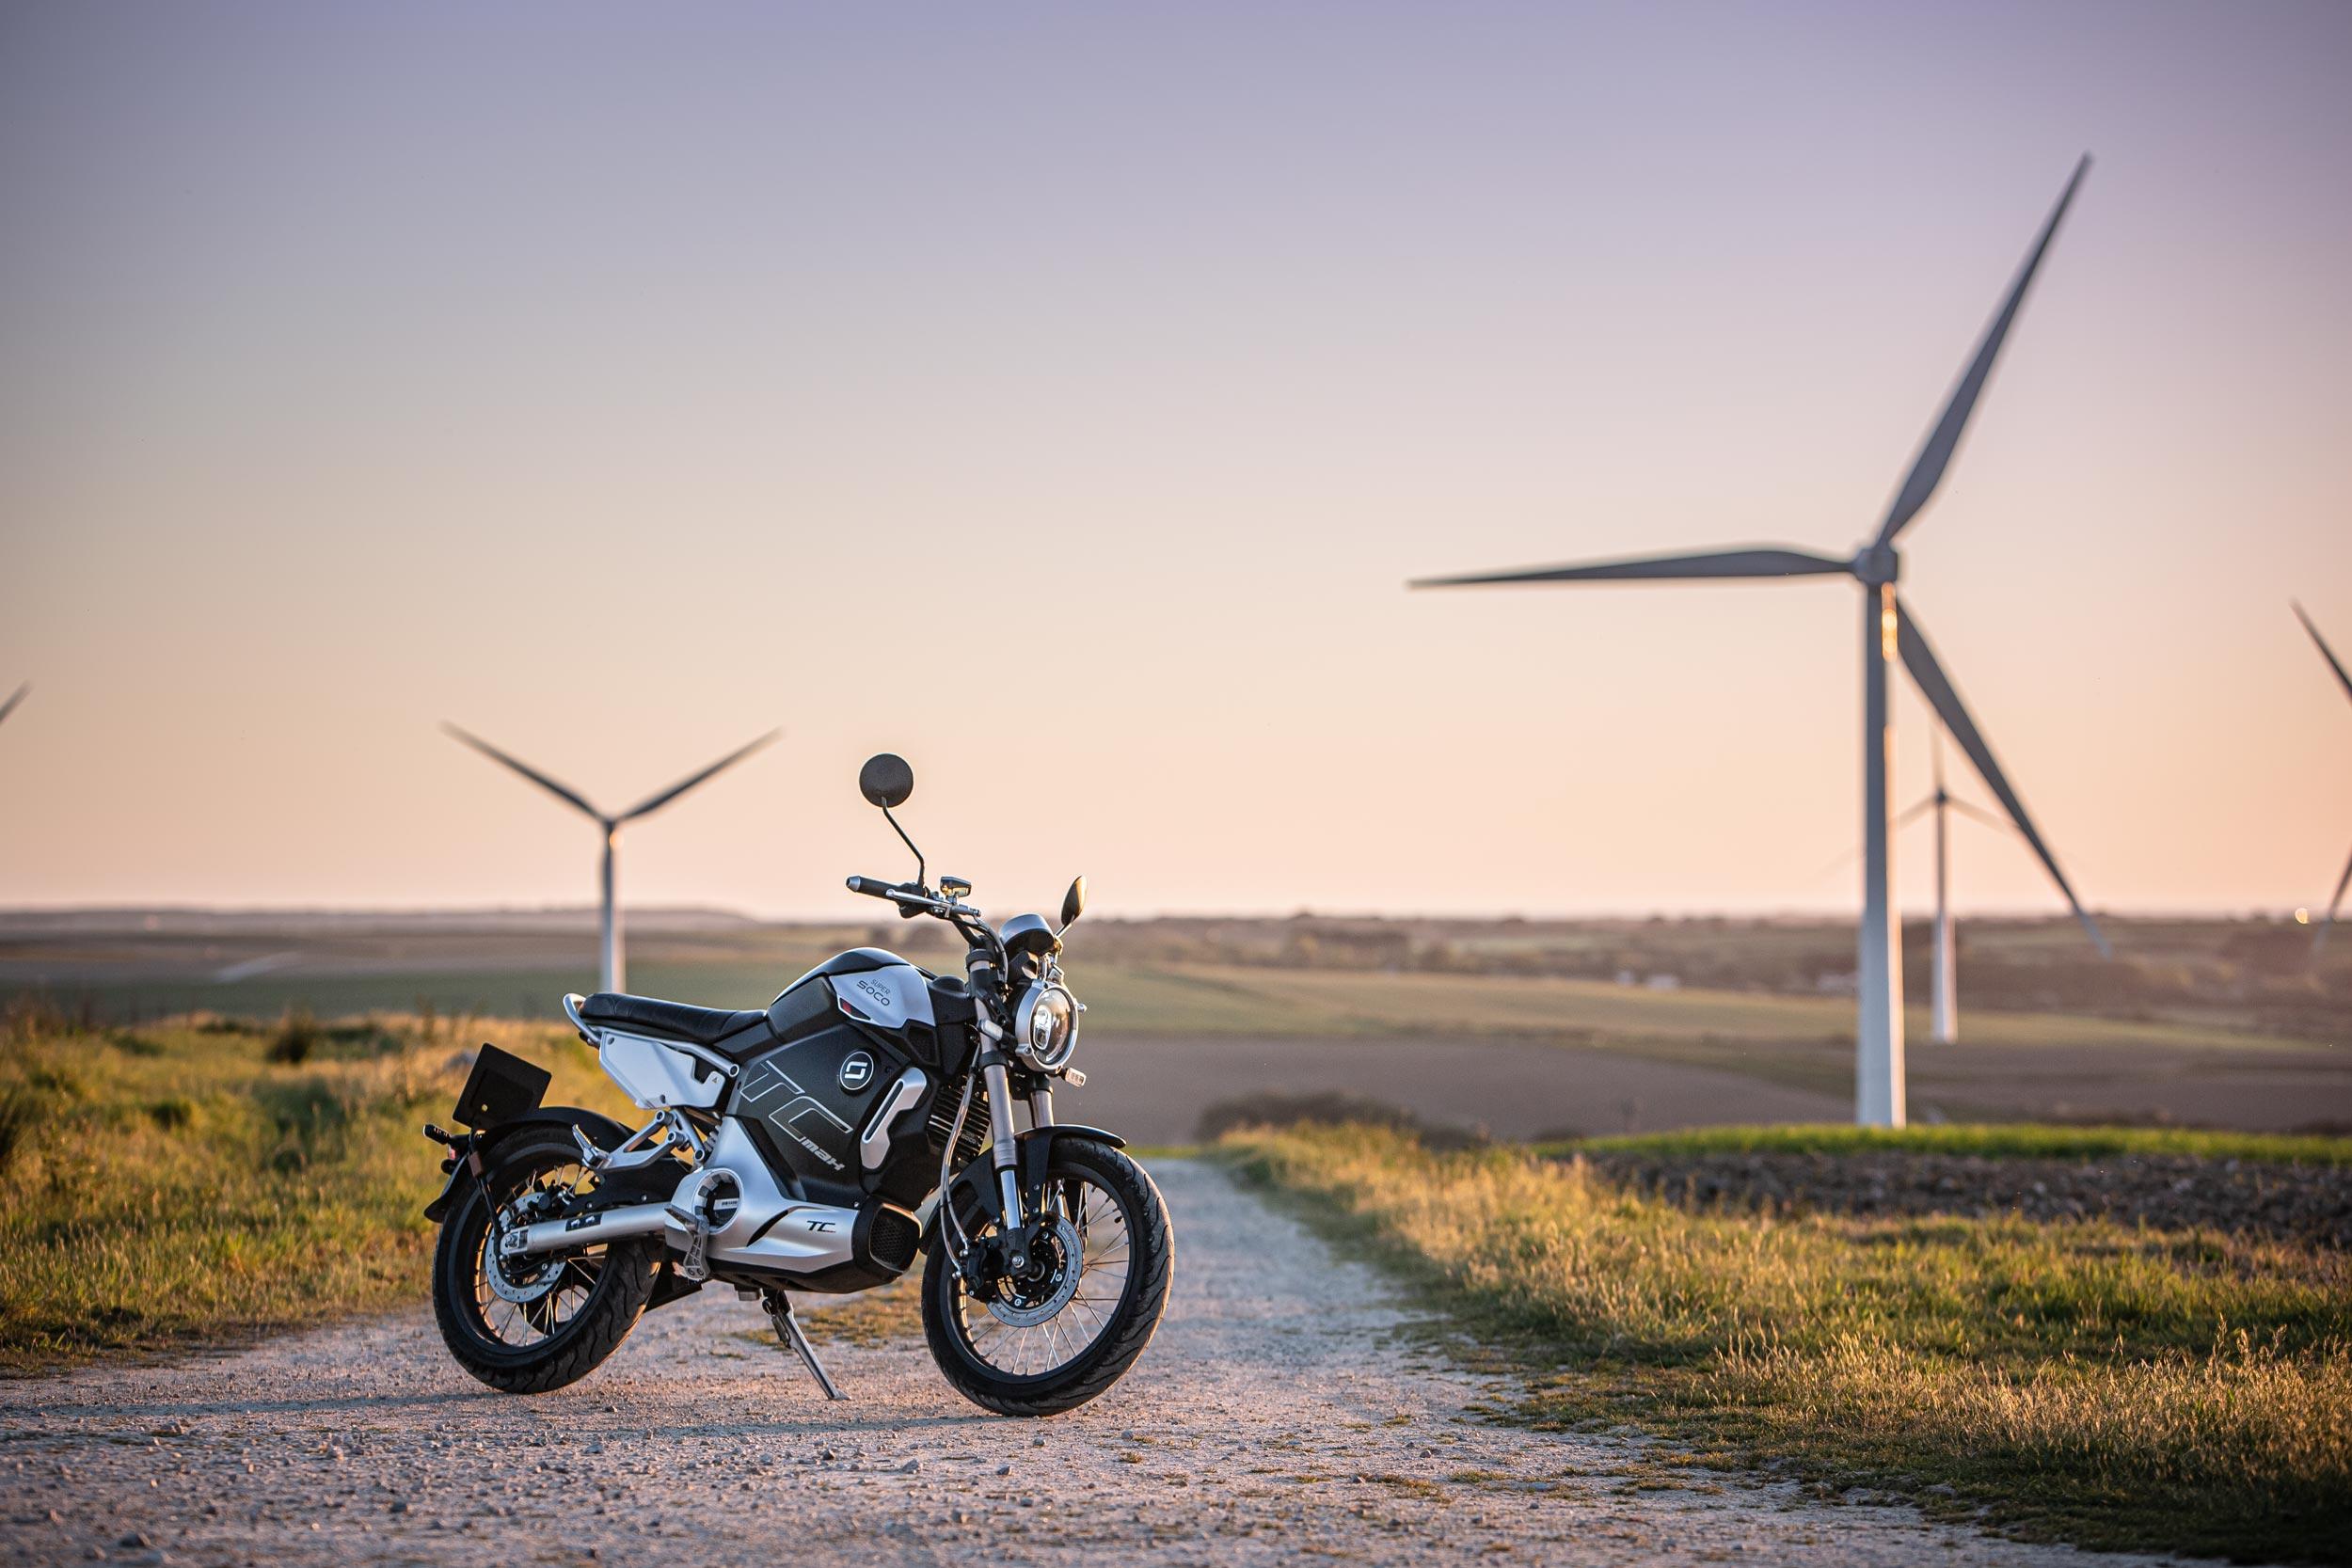 Super Soco TC Max photographed at a wind farm